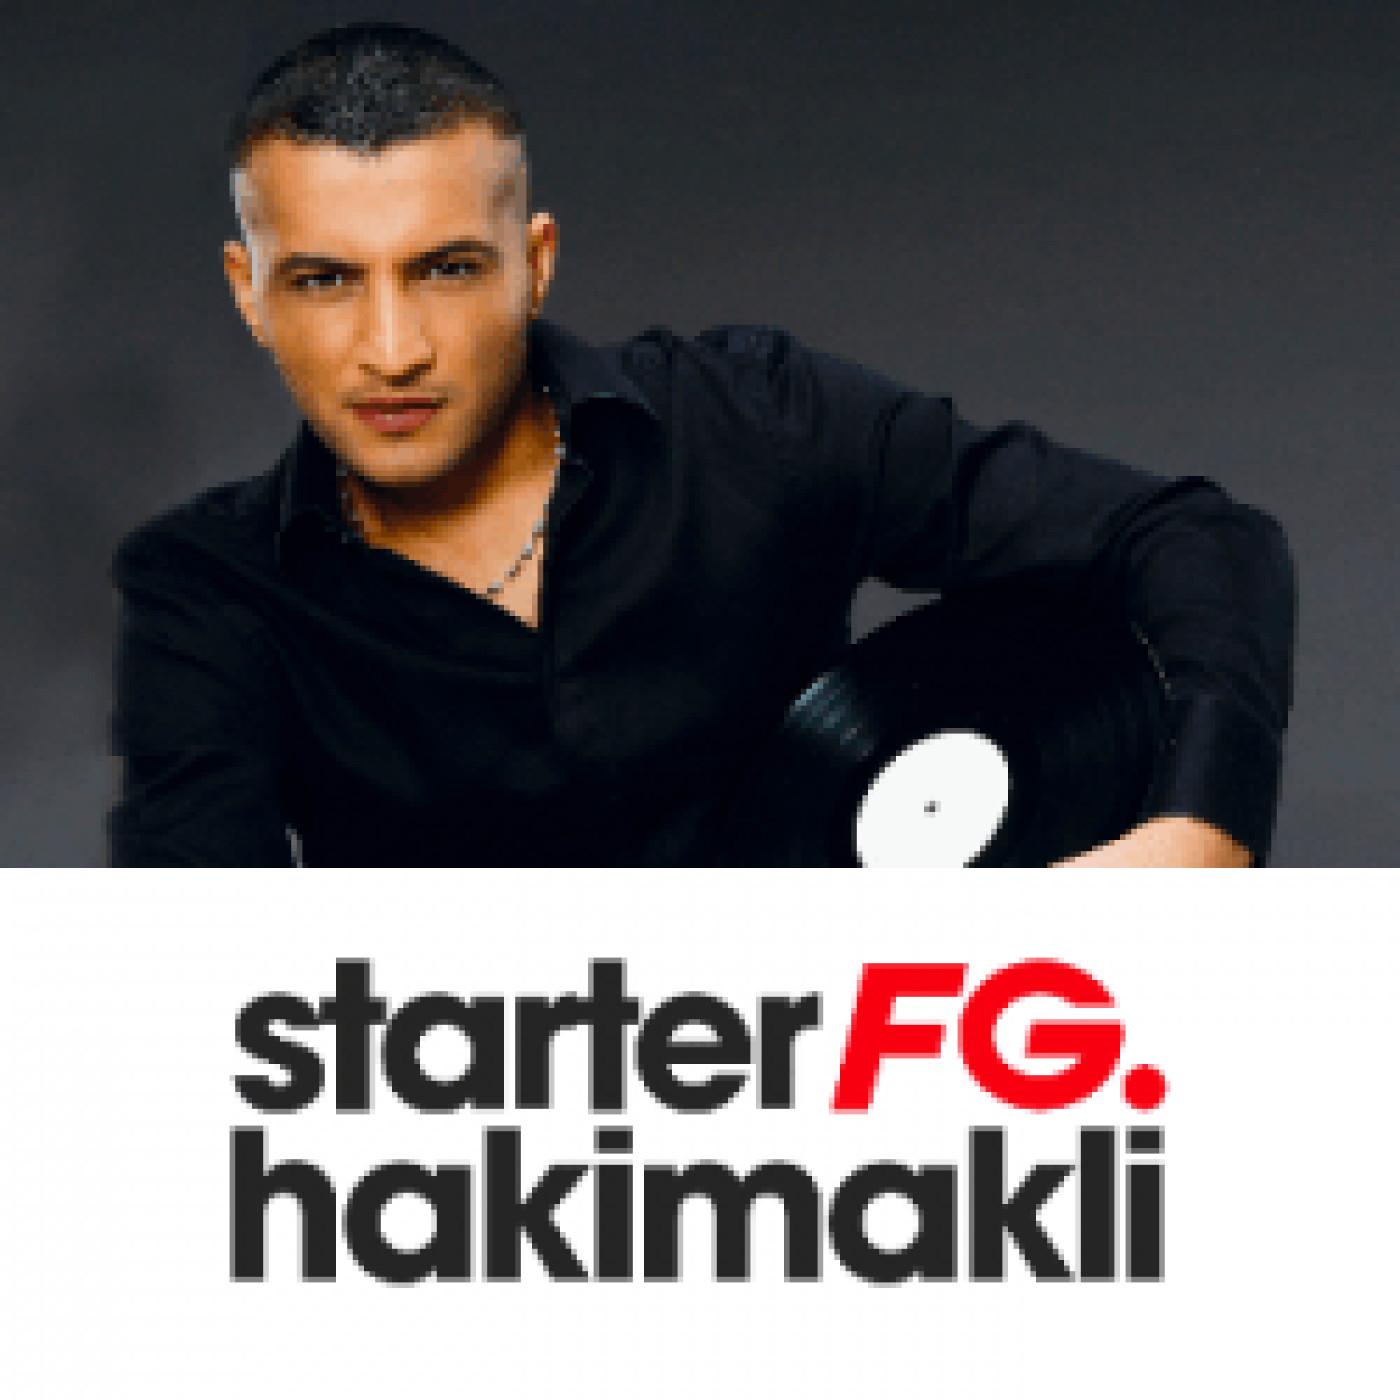 STARTER FG BY HAKIMAKLI MARDI 22 SEPTEMBRE 2020